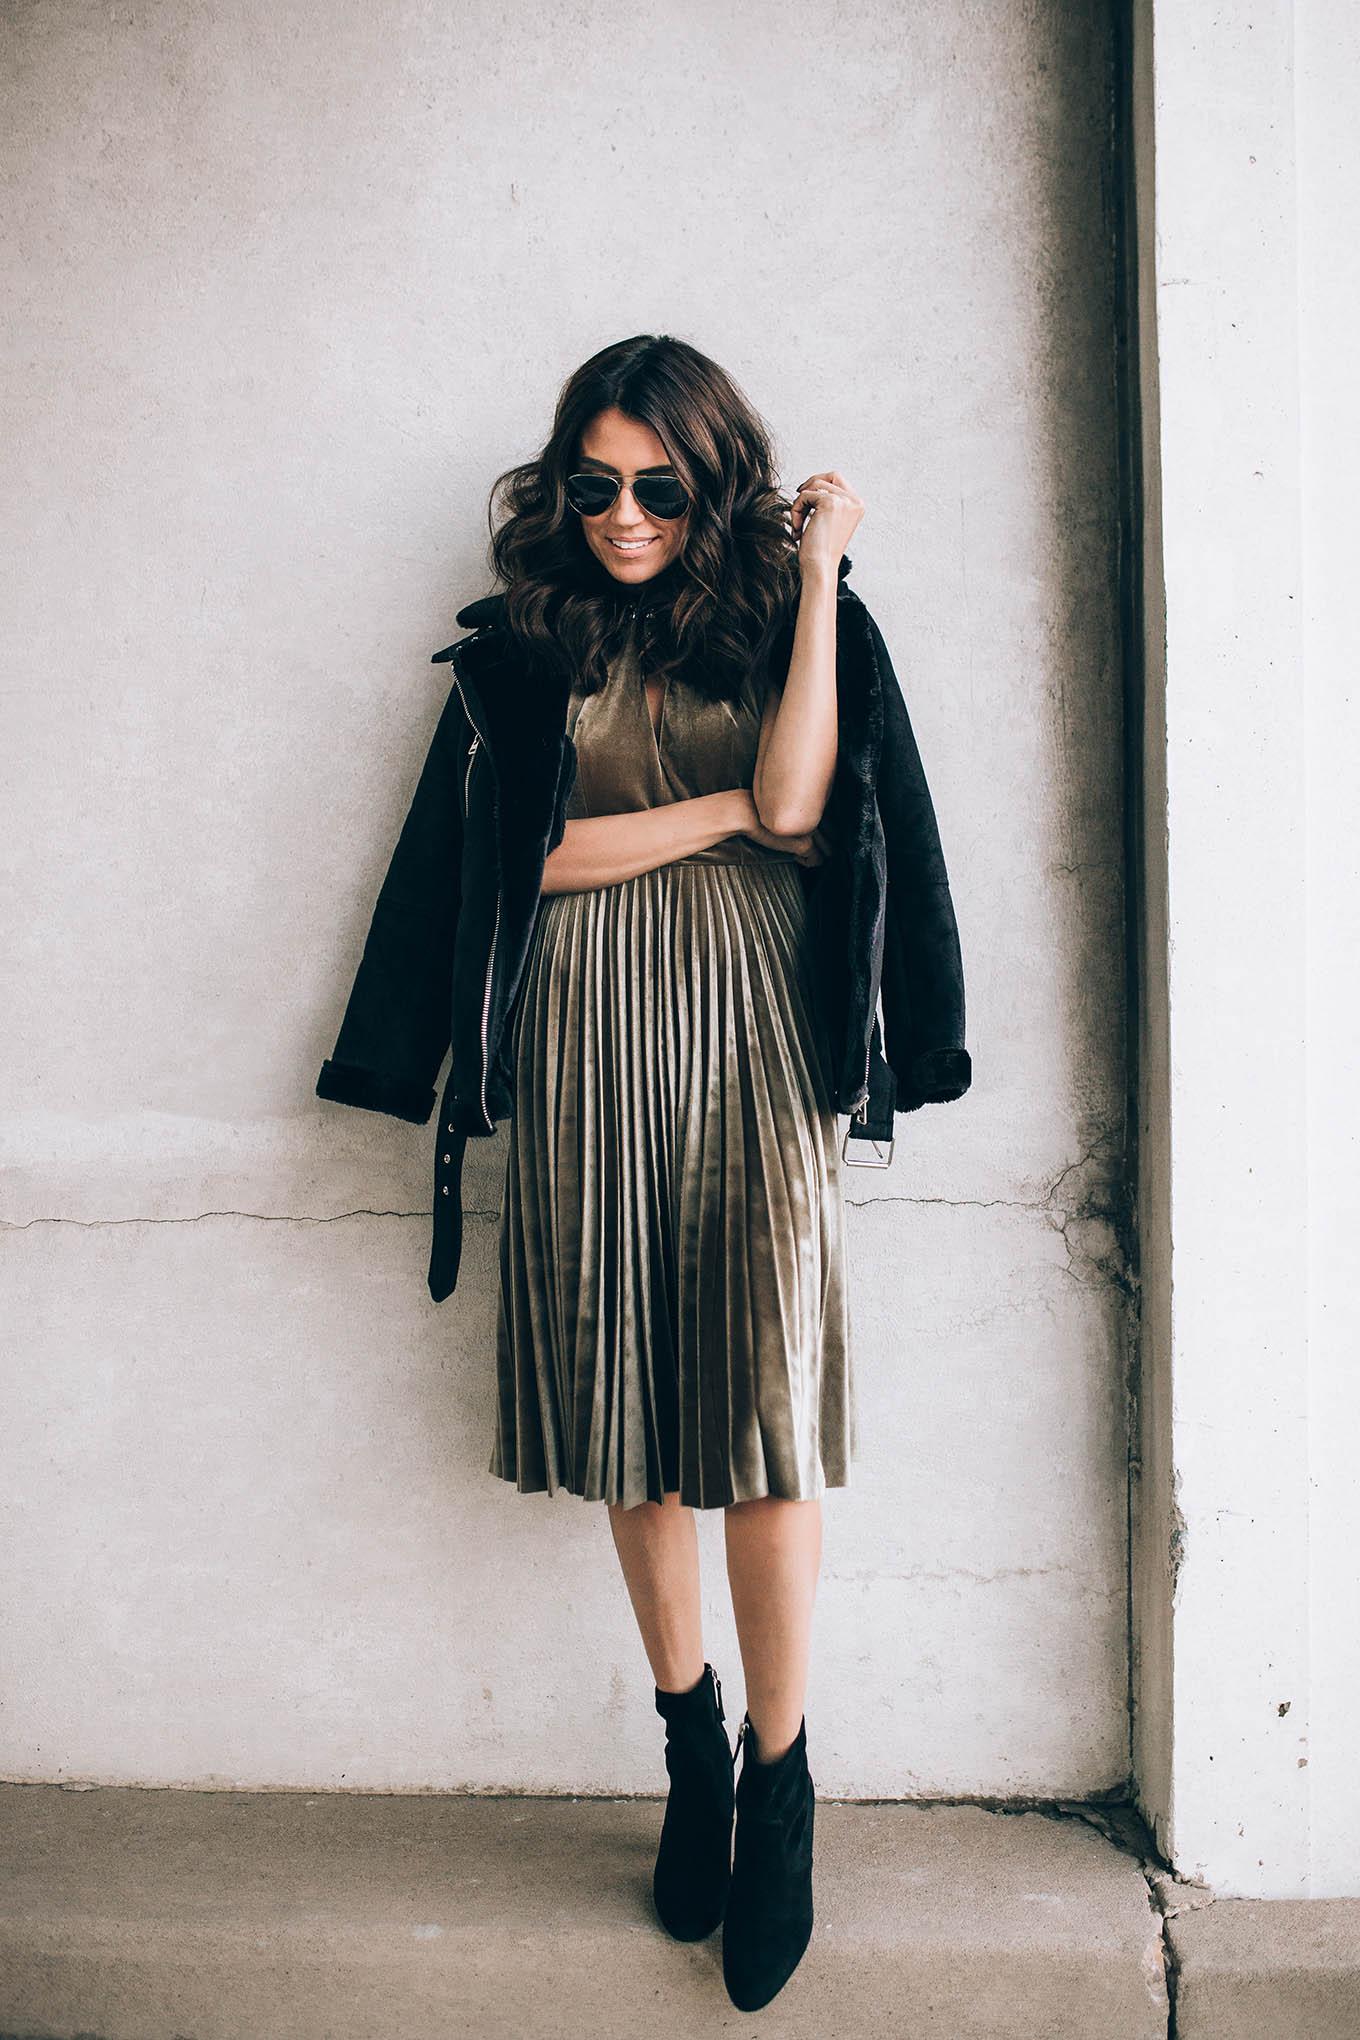 velvet dress and leather jacket